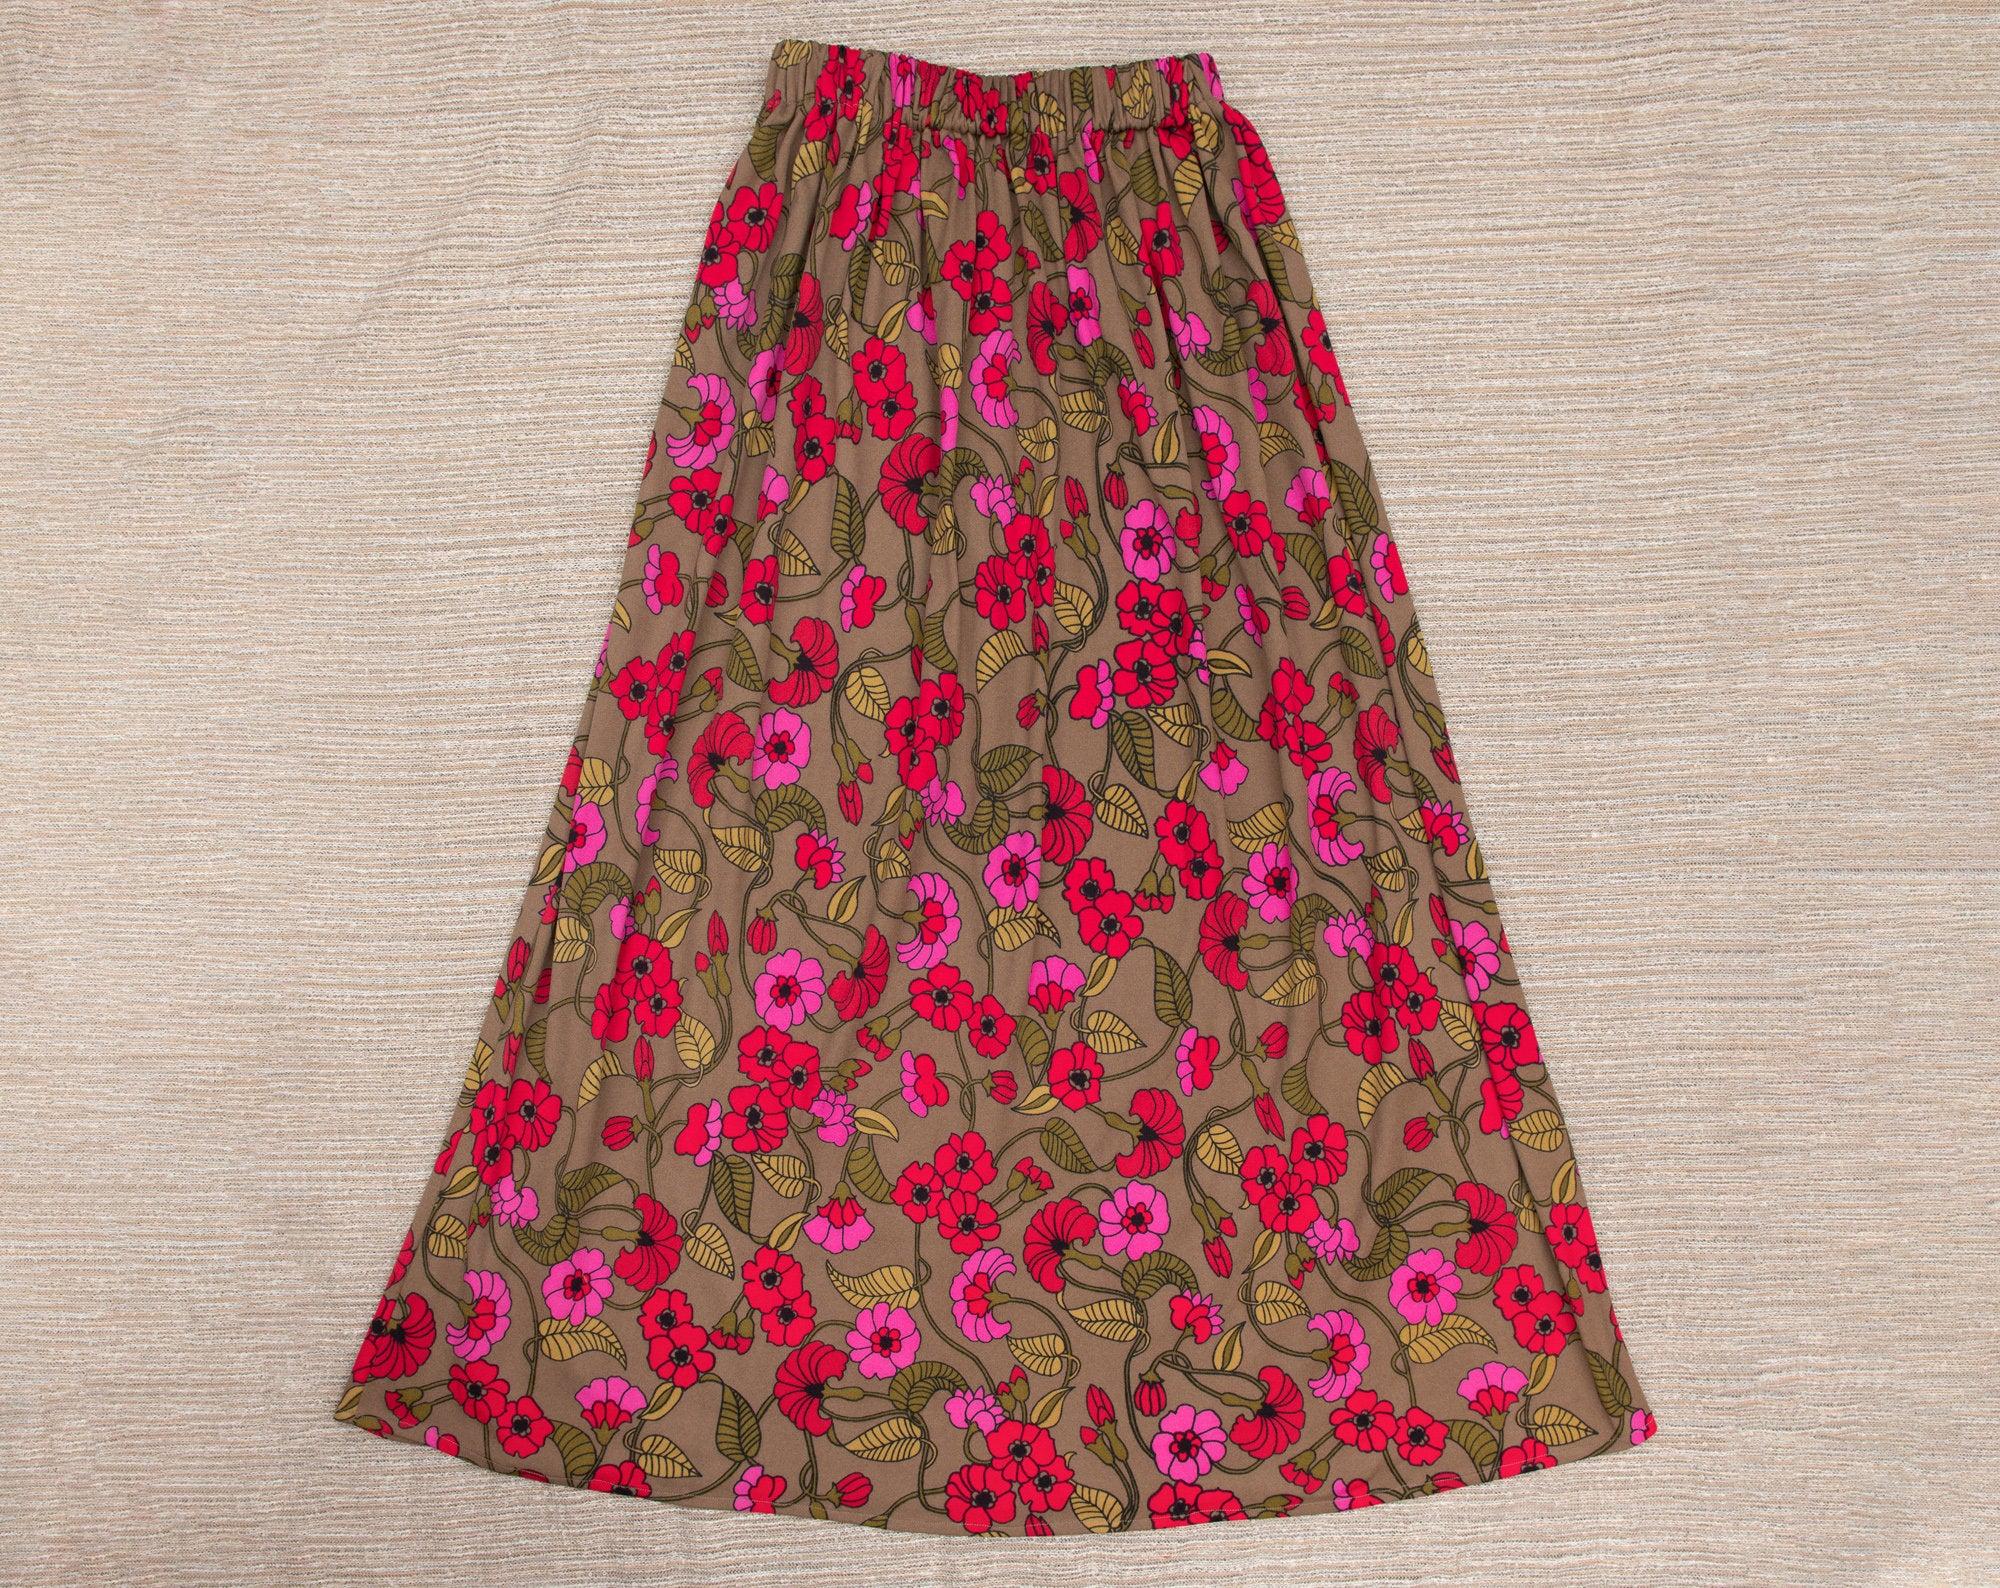 Handmade Hippy Boho Peace Skirt Bag